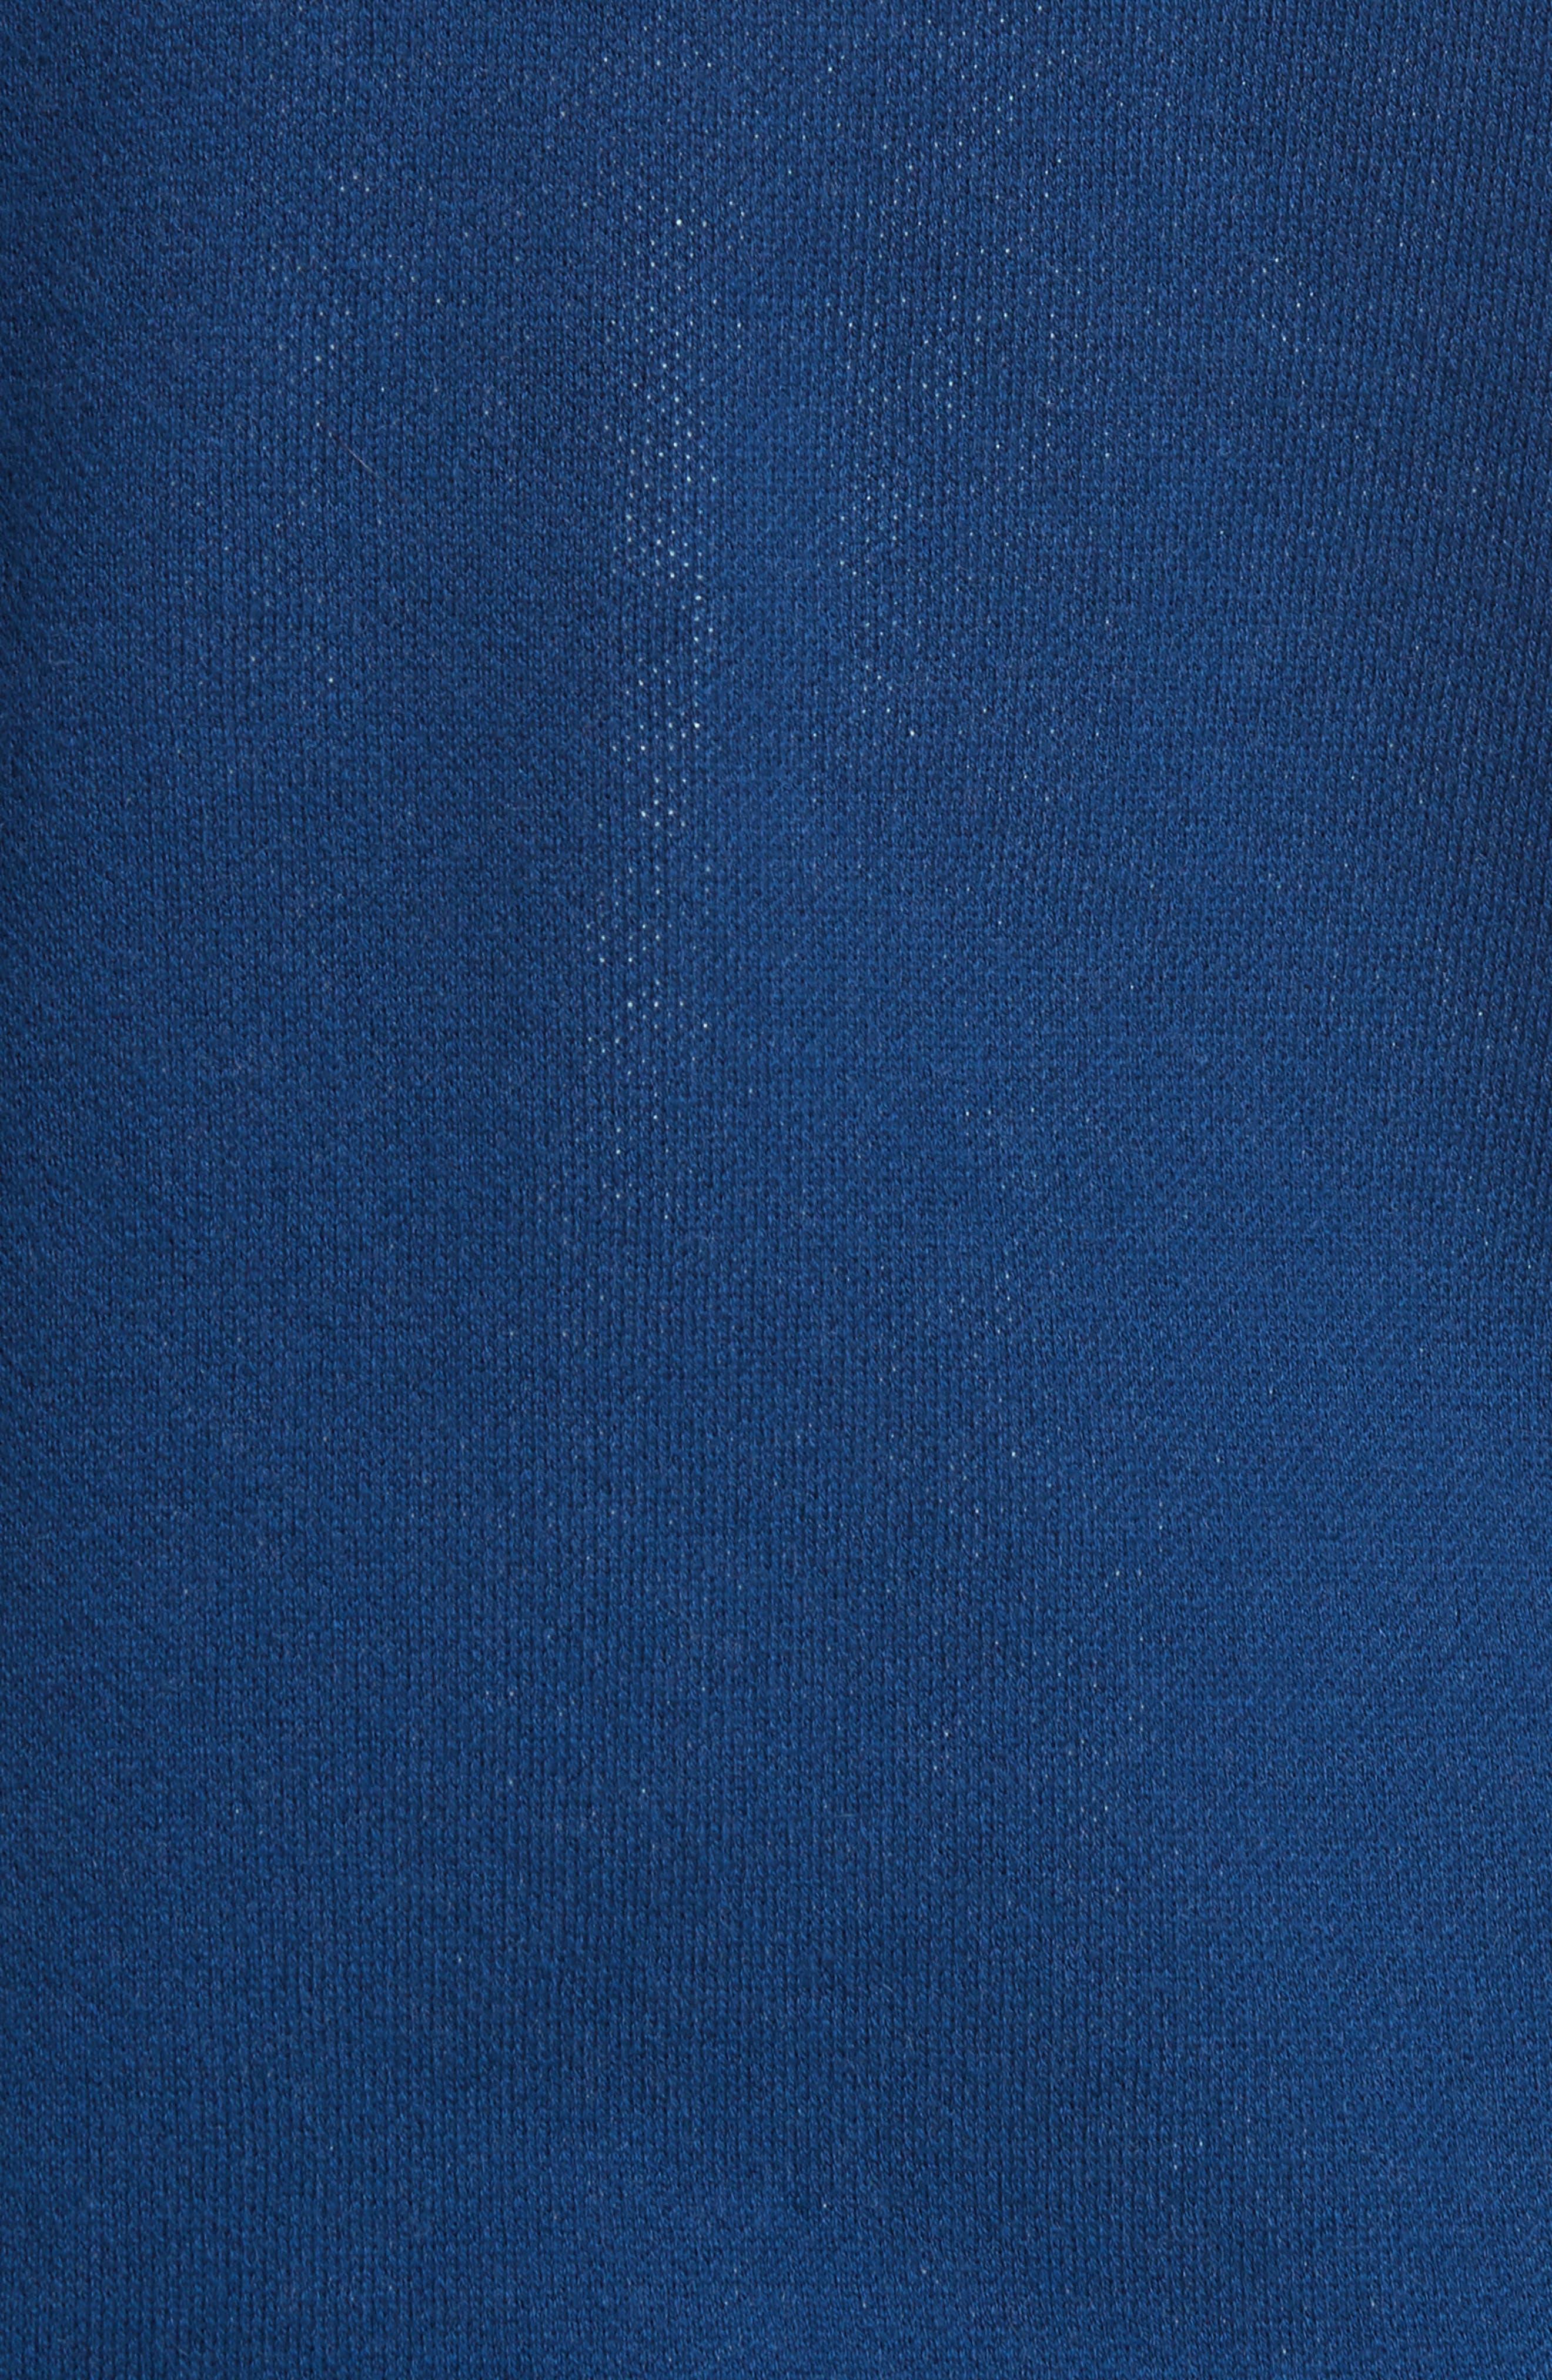 CIA Crewneck Sweater,                             Alternate thumbnail 5, color,                             Bleu Fonce Iah